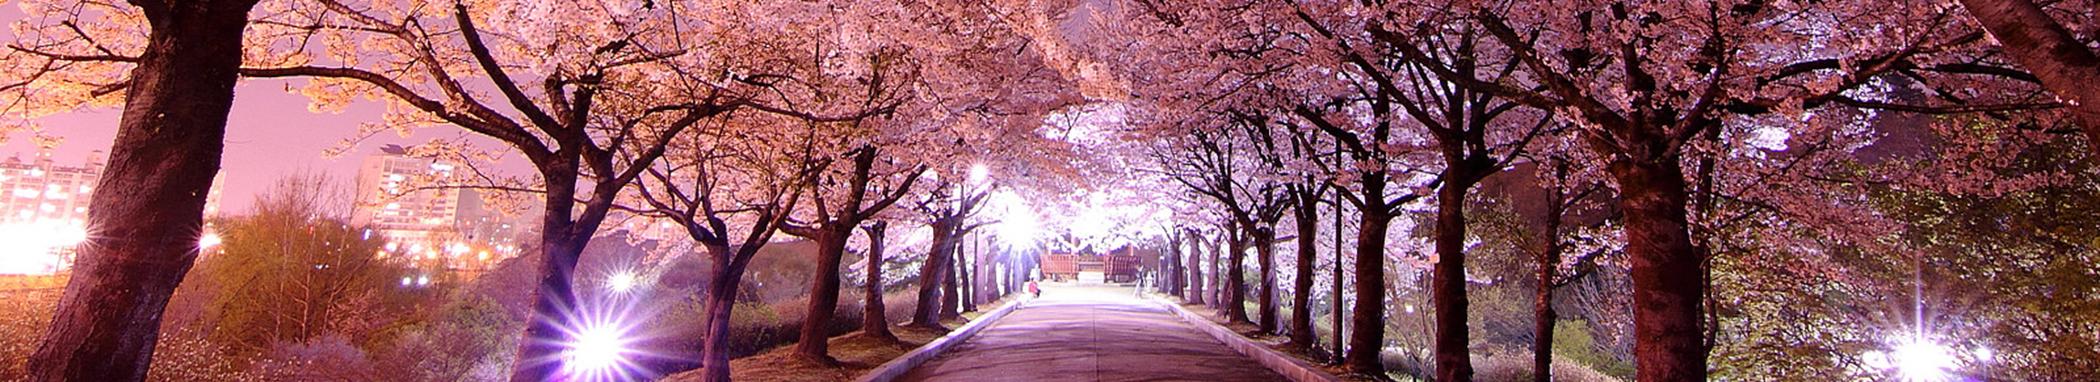 Ароматы весны:<br>Сеул, Кёнджу, Пусан